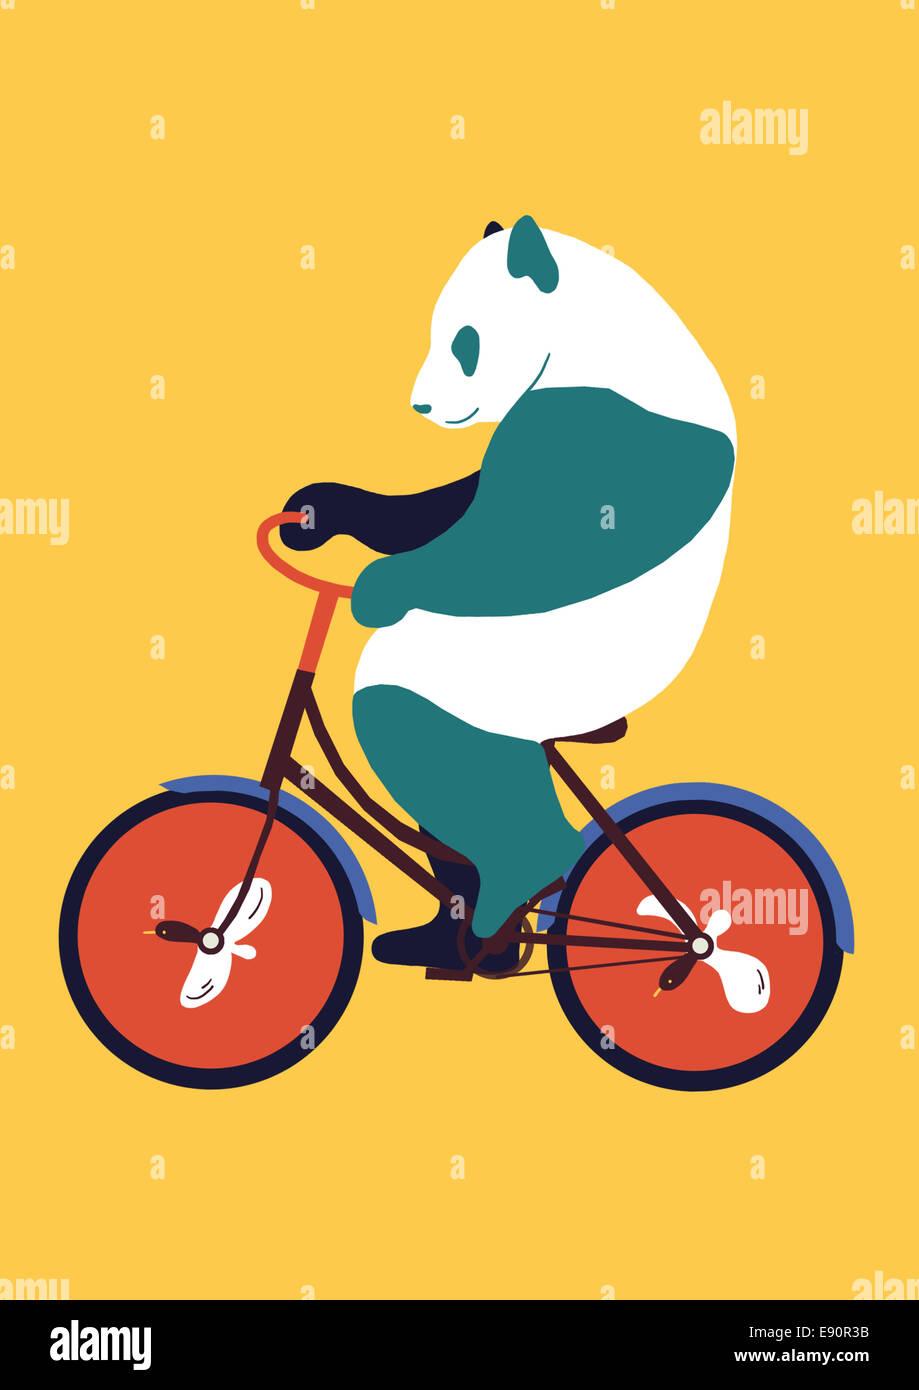 Illustration of a riding panda - Stock Image